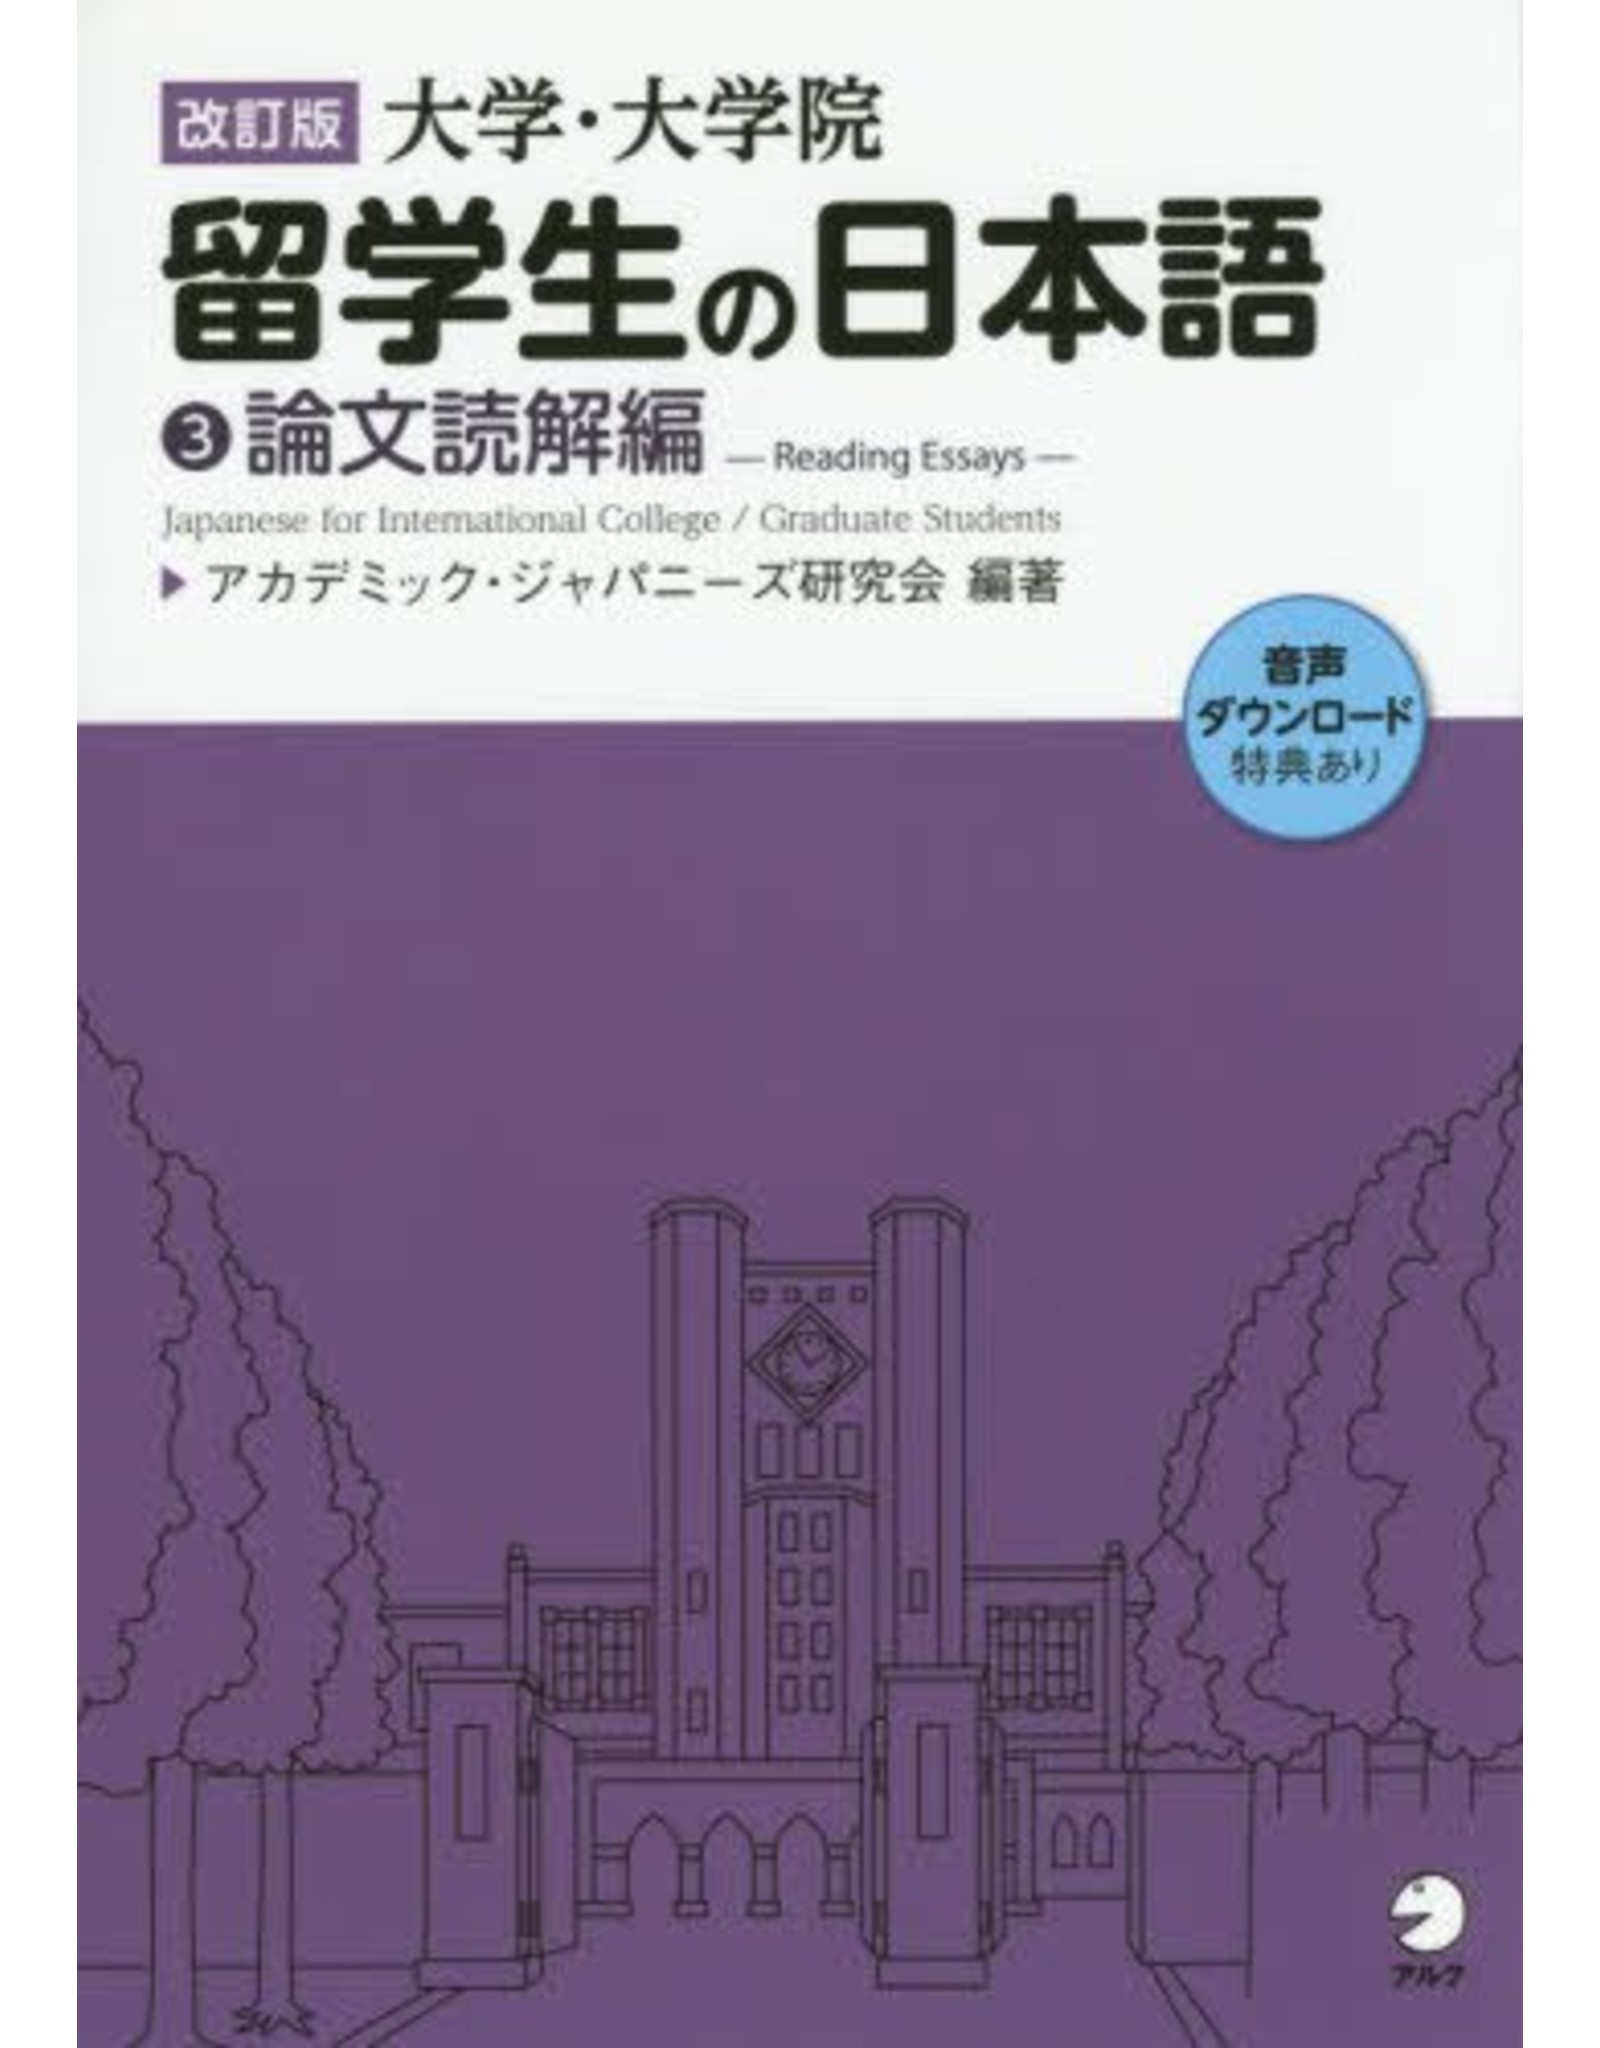 ALC DAIGAKU DAIGAKUIN-SEI NO NIHONGO (3) - JAPANESE FOR INTERNATIONAL COLLEGE/GRADUATE STUDENTS (3)